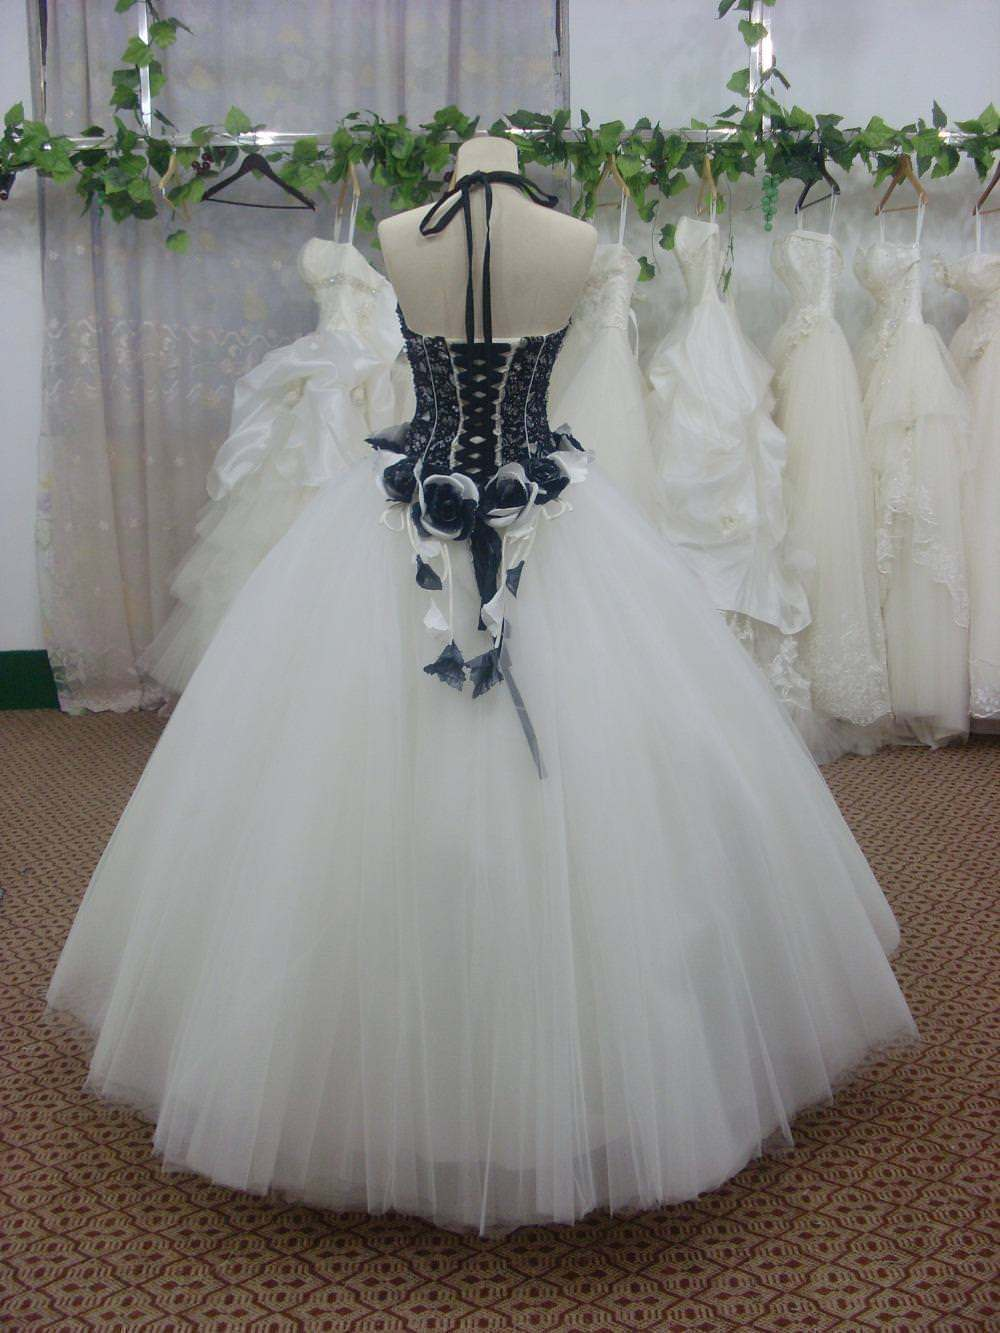 Bealegantom 2019 Quinceanera Dresses Ball Gown Crystals Black Lace Lace Up Vestido De Debutante Sweet 16 Party Dress QA1464 in Quinceanera Dresses from Weddings Events